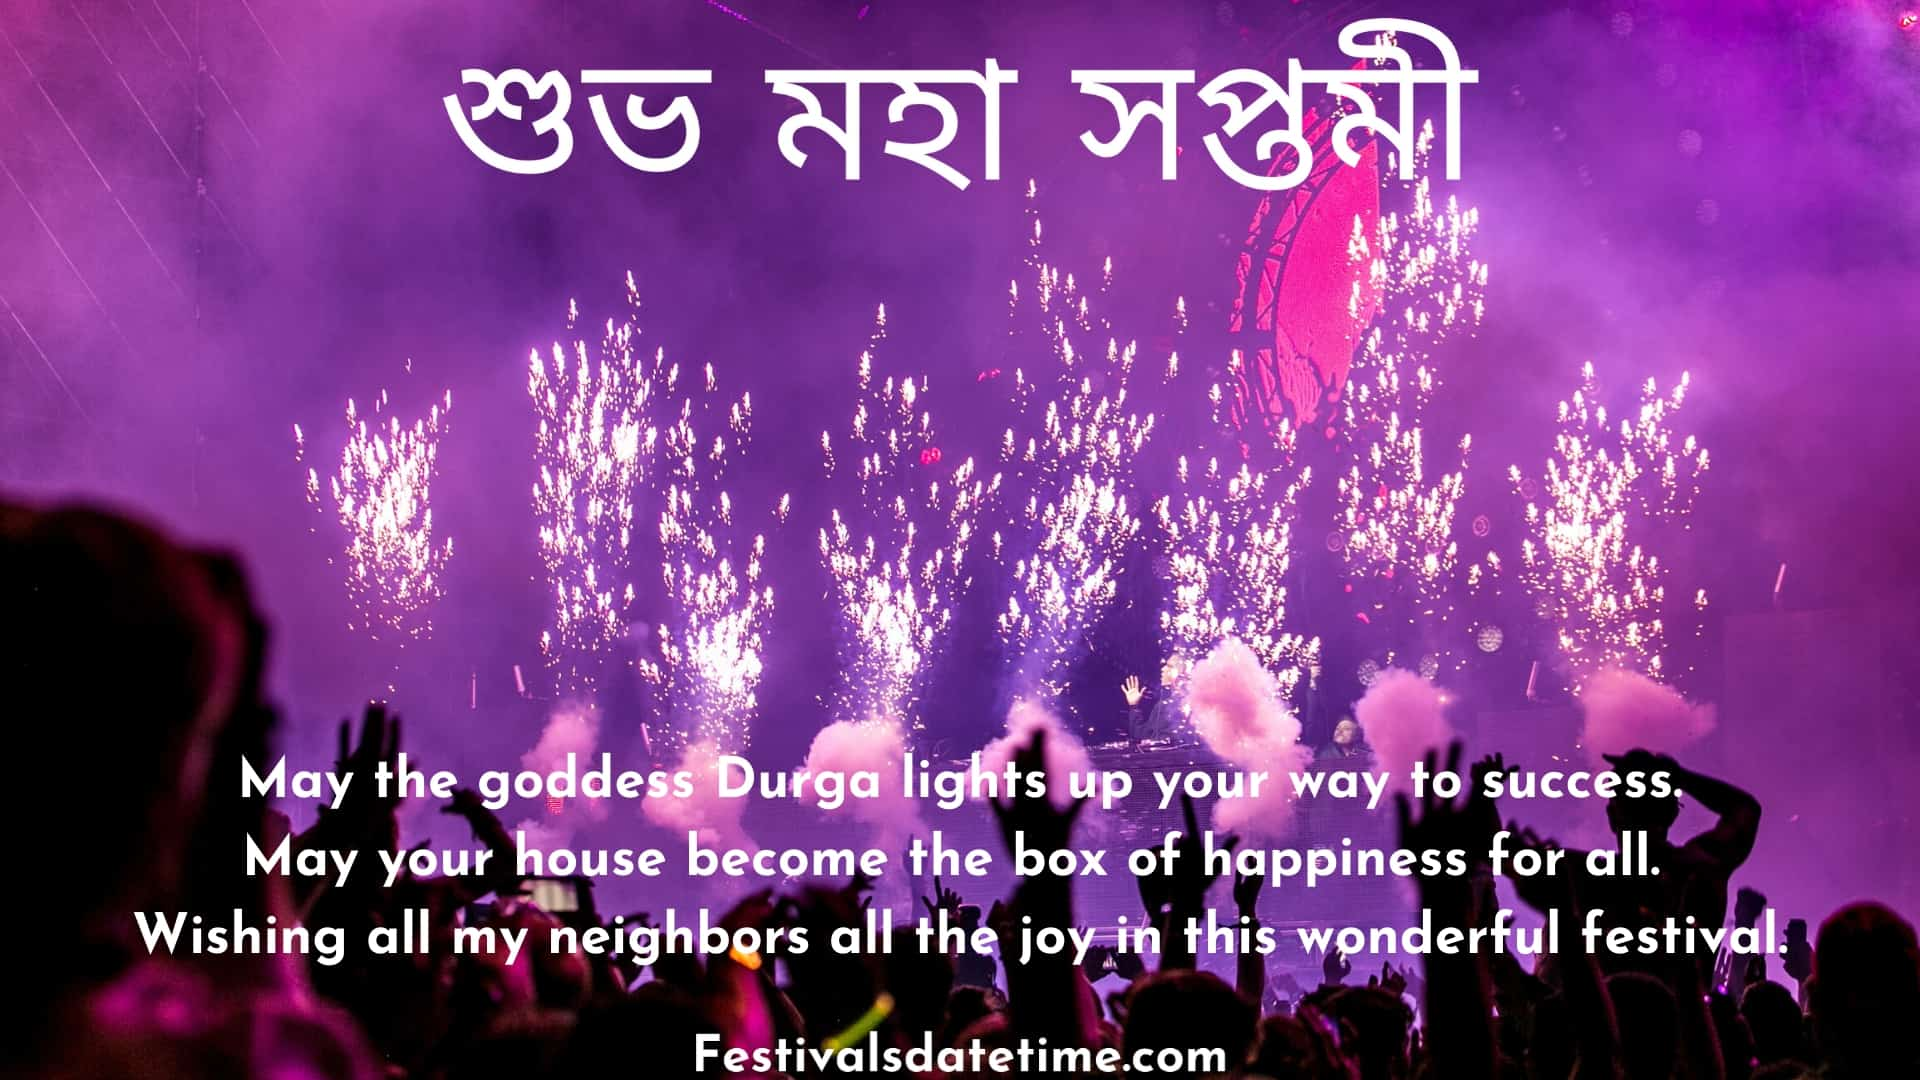 subha_saptami_image_download